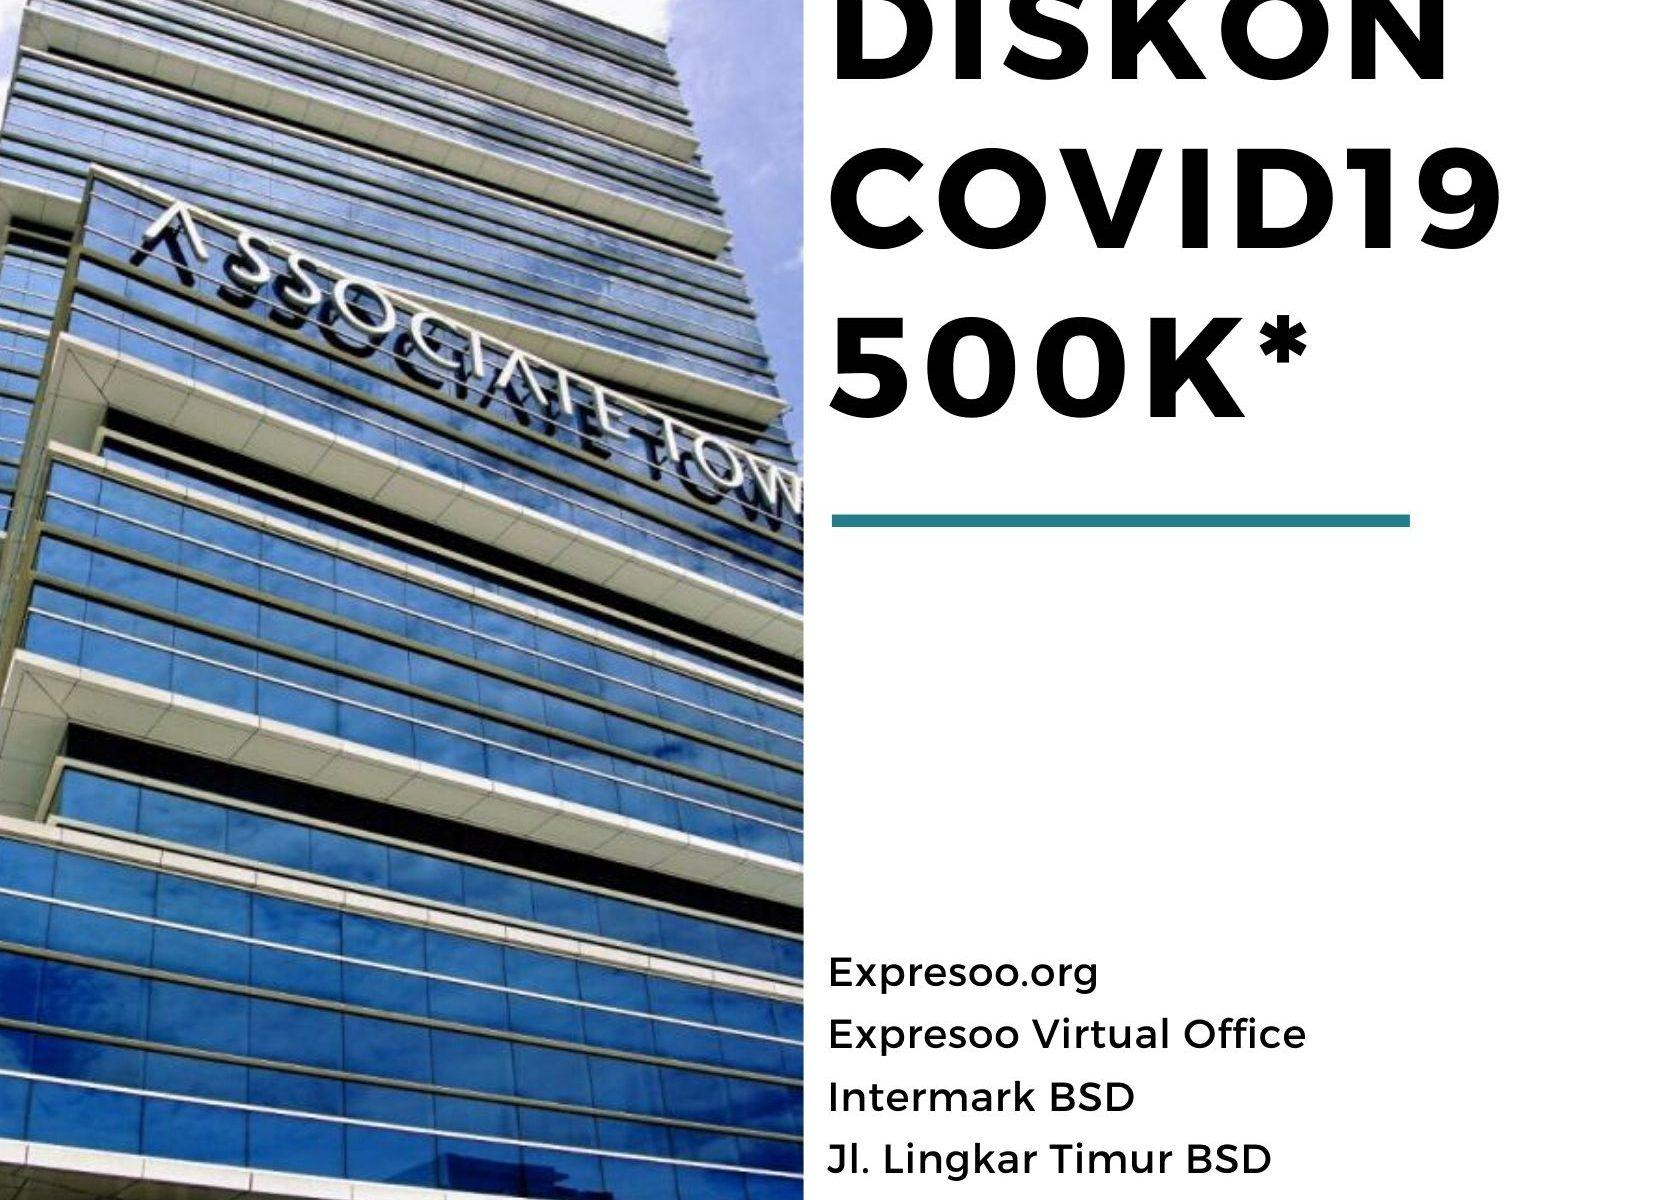 Diskon Covid 19